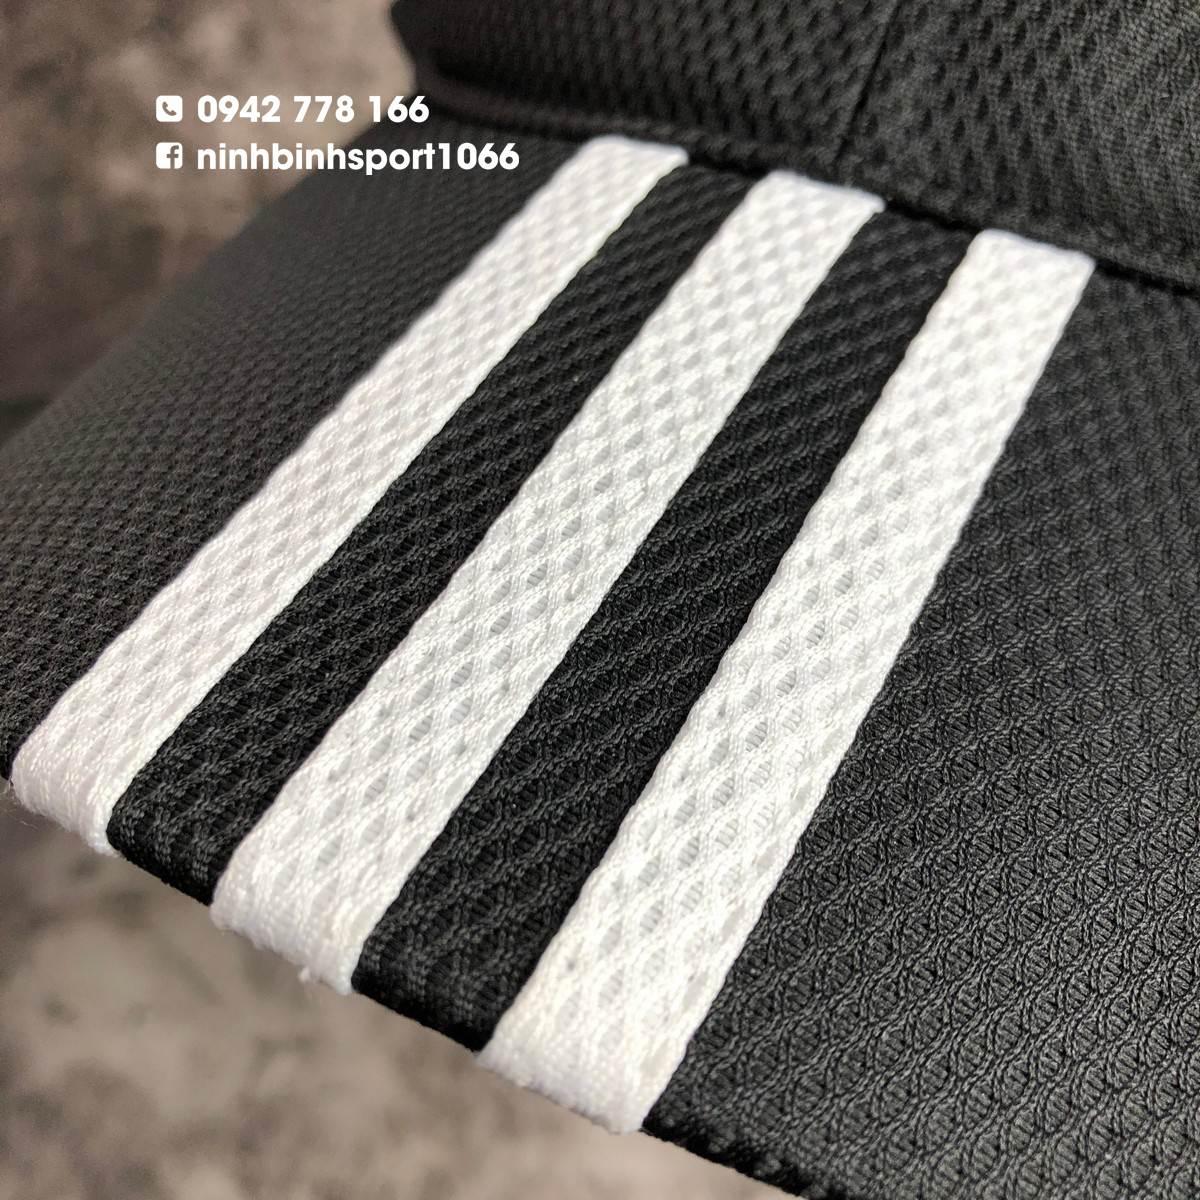 Mũ thể thao Adidas 524-01-OSFZ